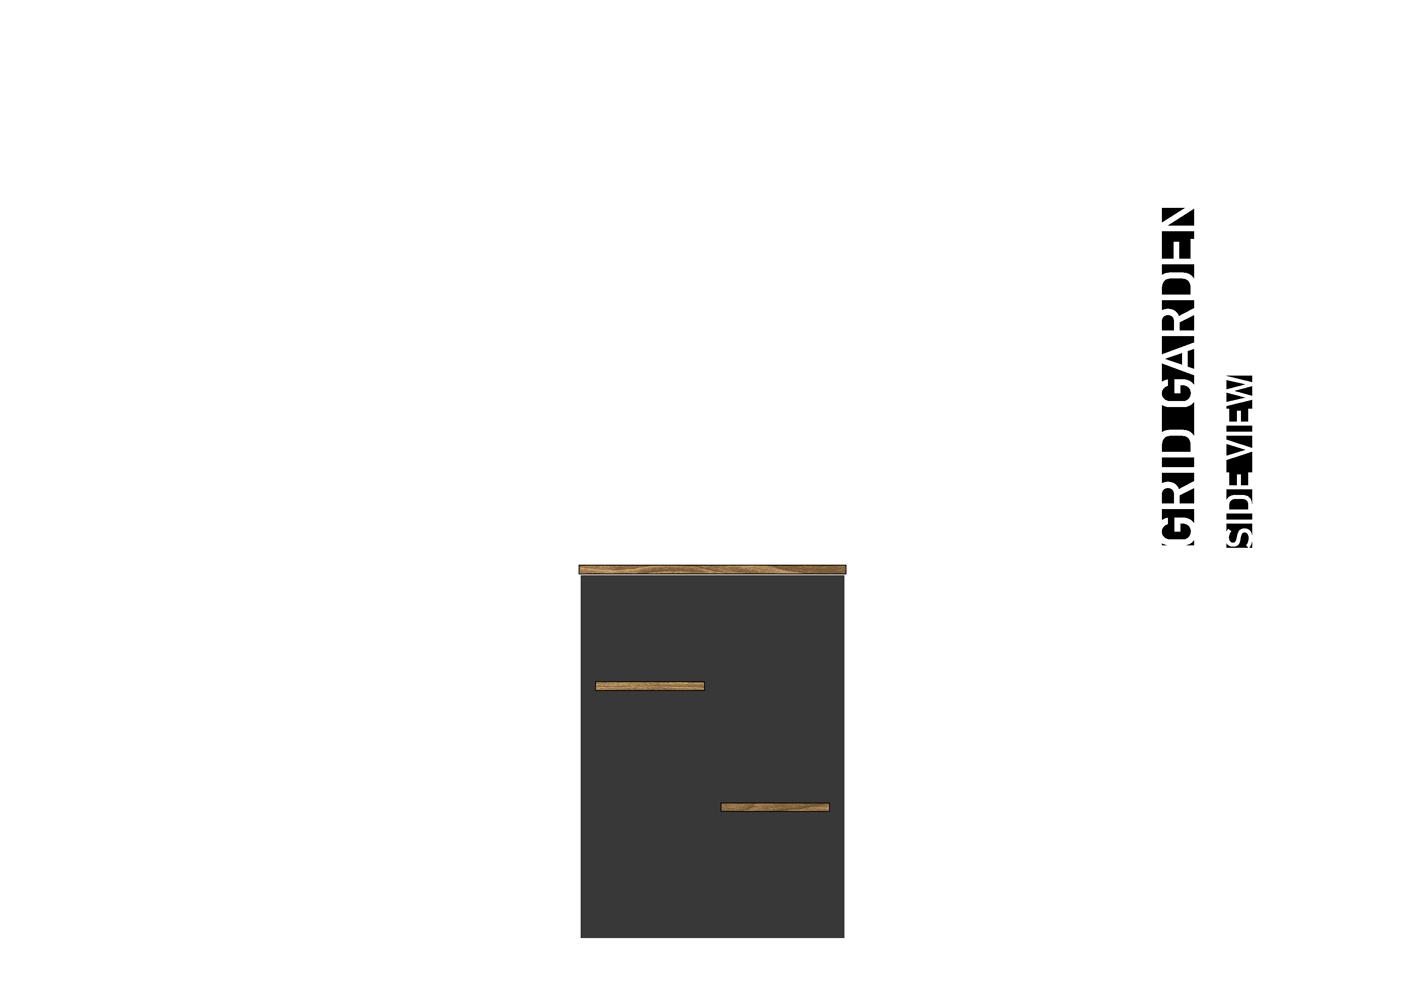 GRID GARDAN-Side-view